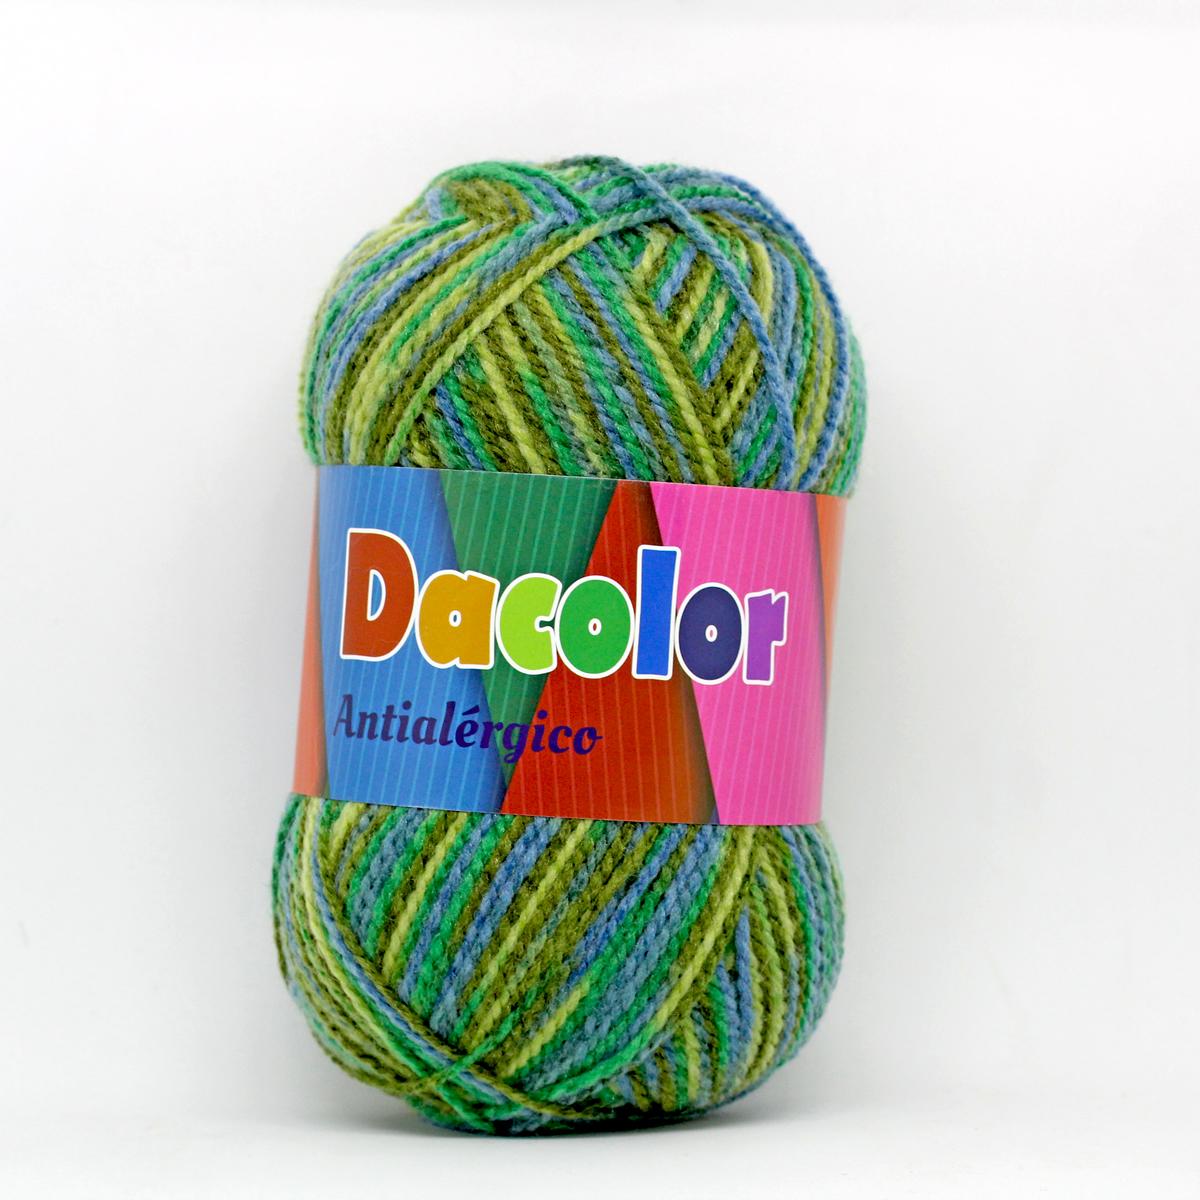 Dacolor - 47